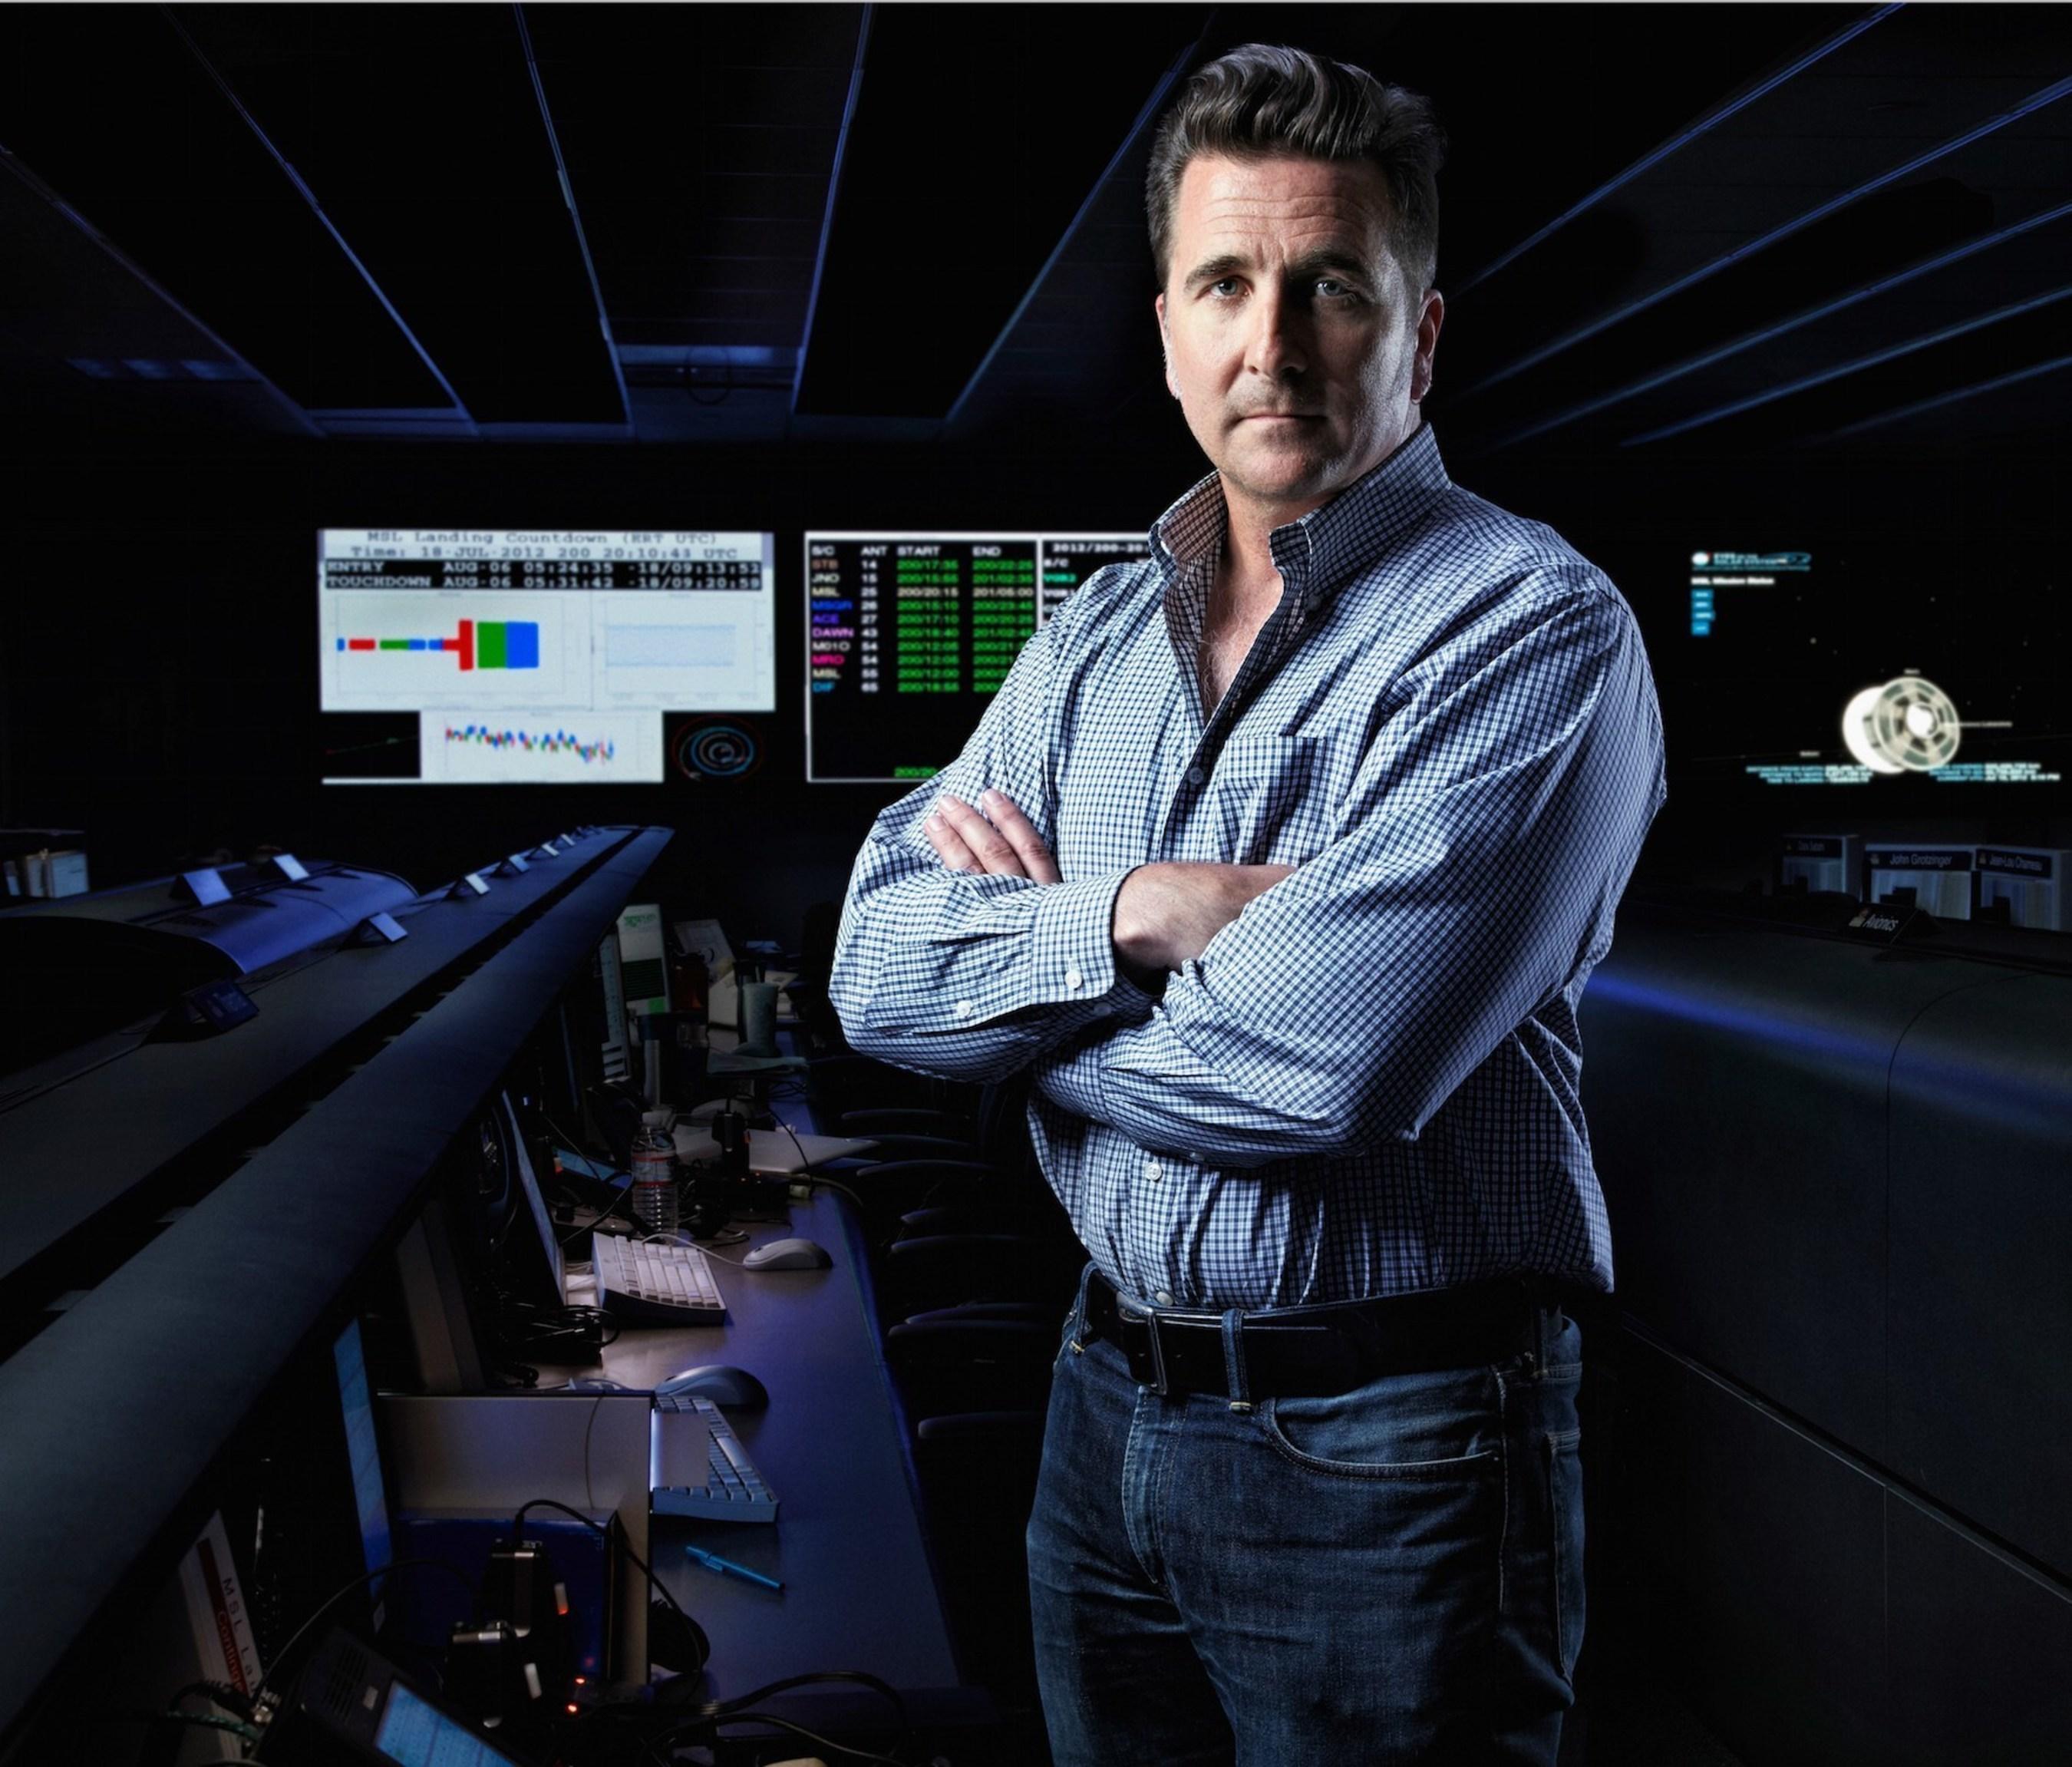 Adam Steltzner, Team Leader & Chief Engineer EDL, NASA Mars Rover Curiosity